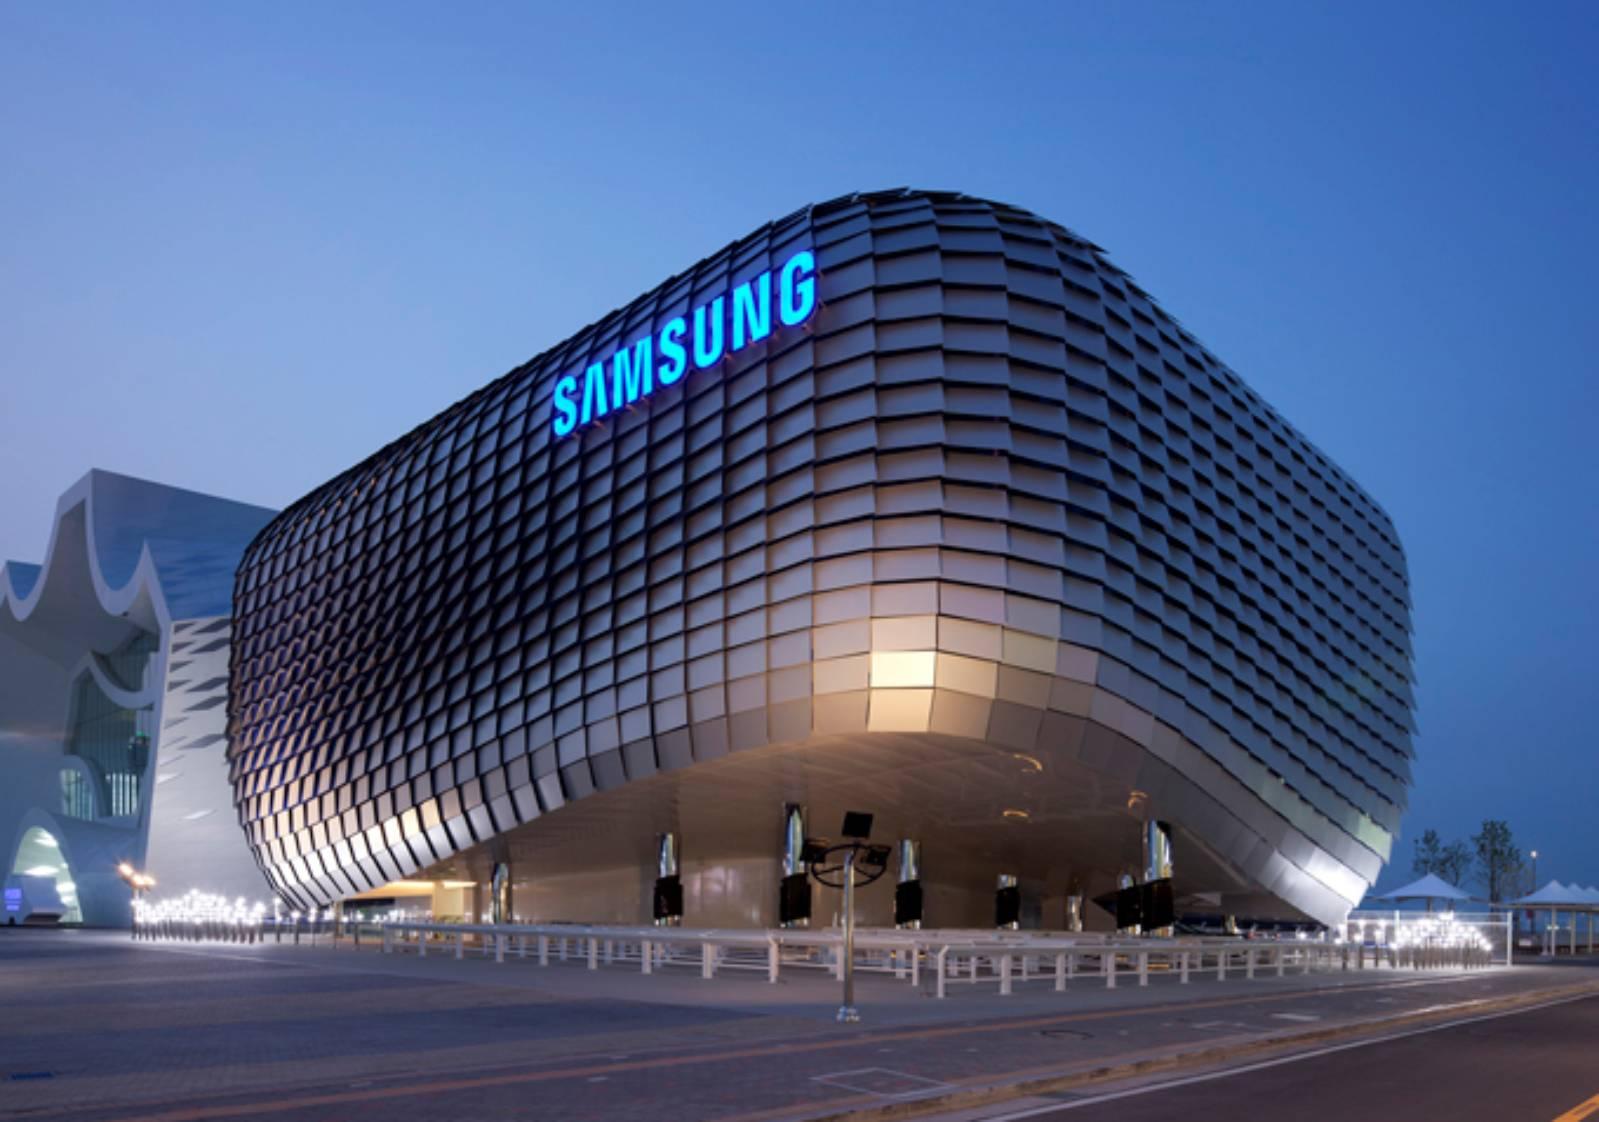 Samsung announces 11nm LPP production, 7nm EUV for 2018